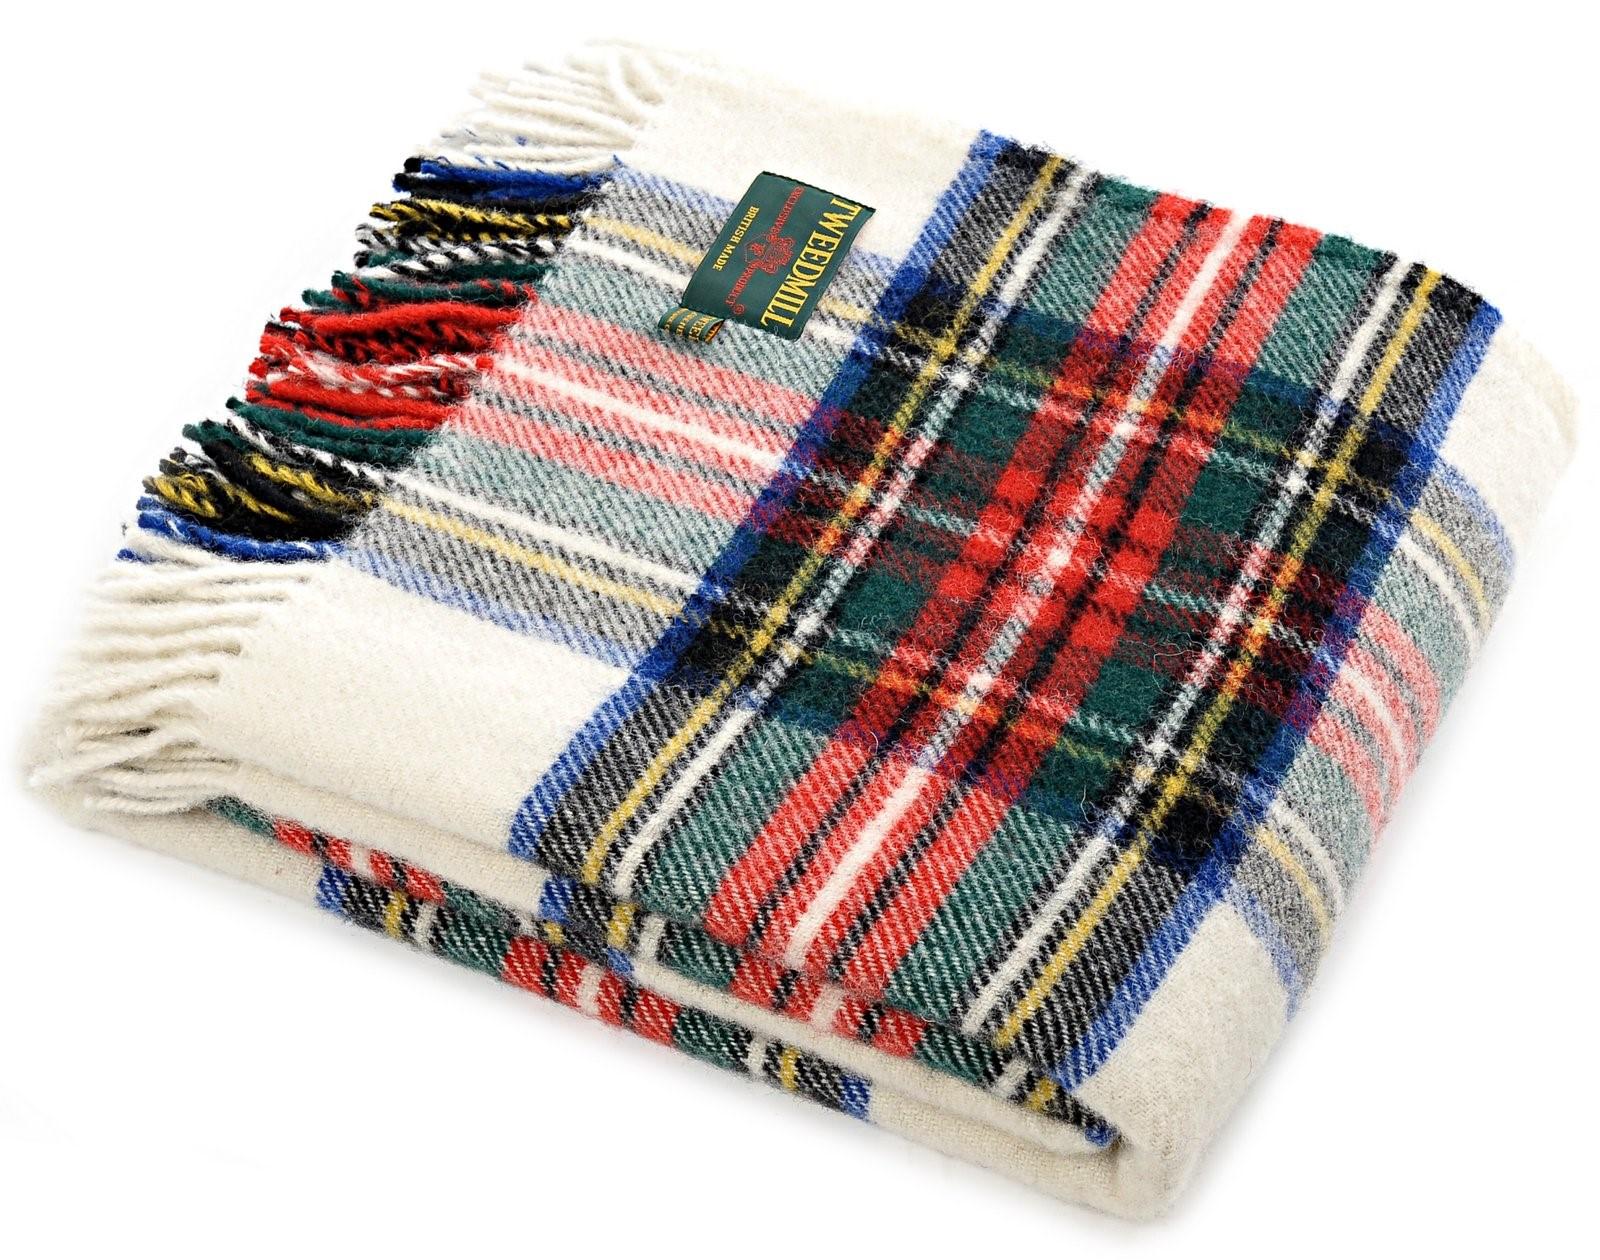 Wool Blanket Online British Made Gifts Dress